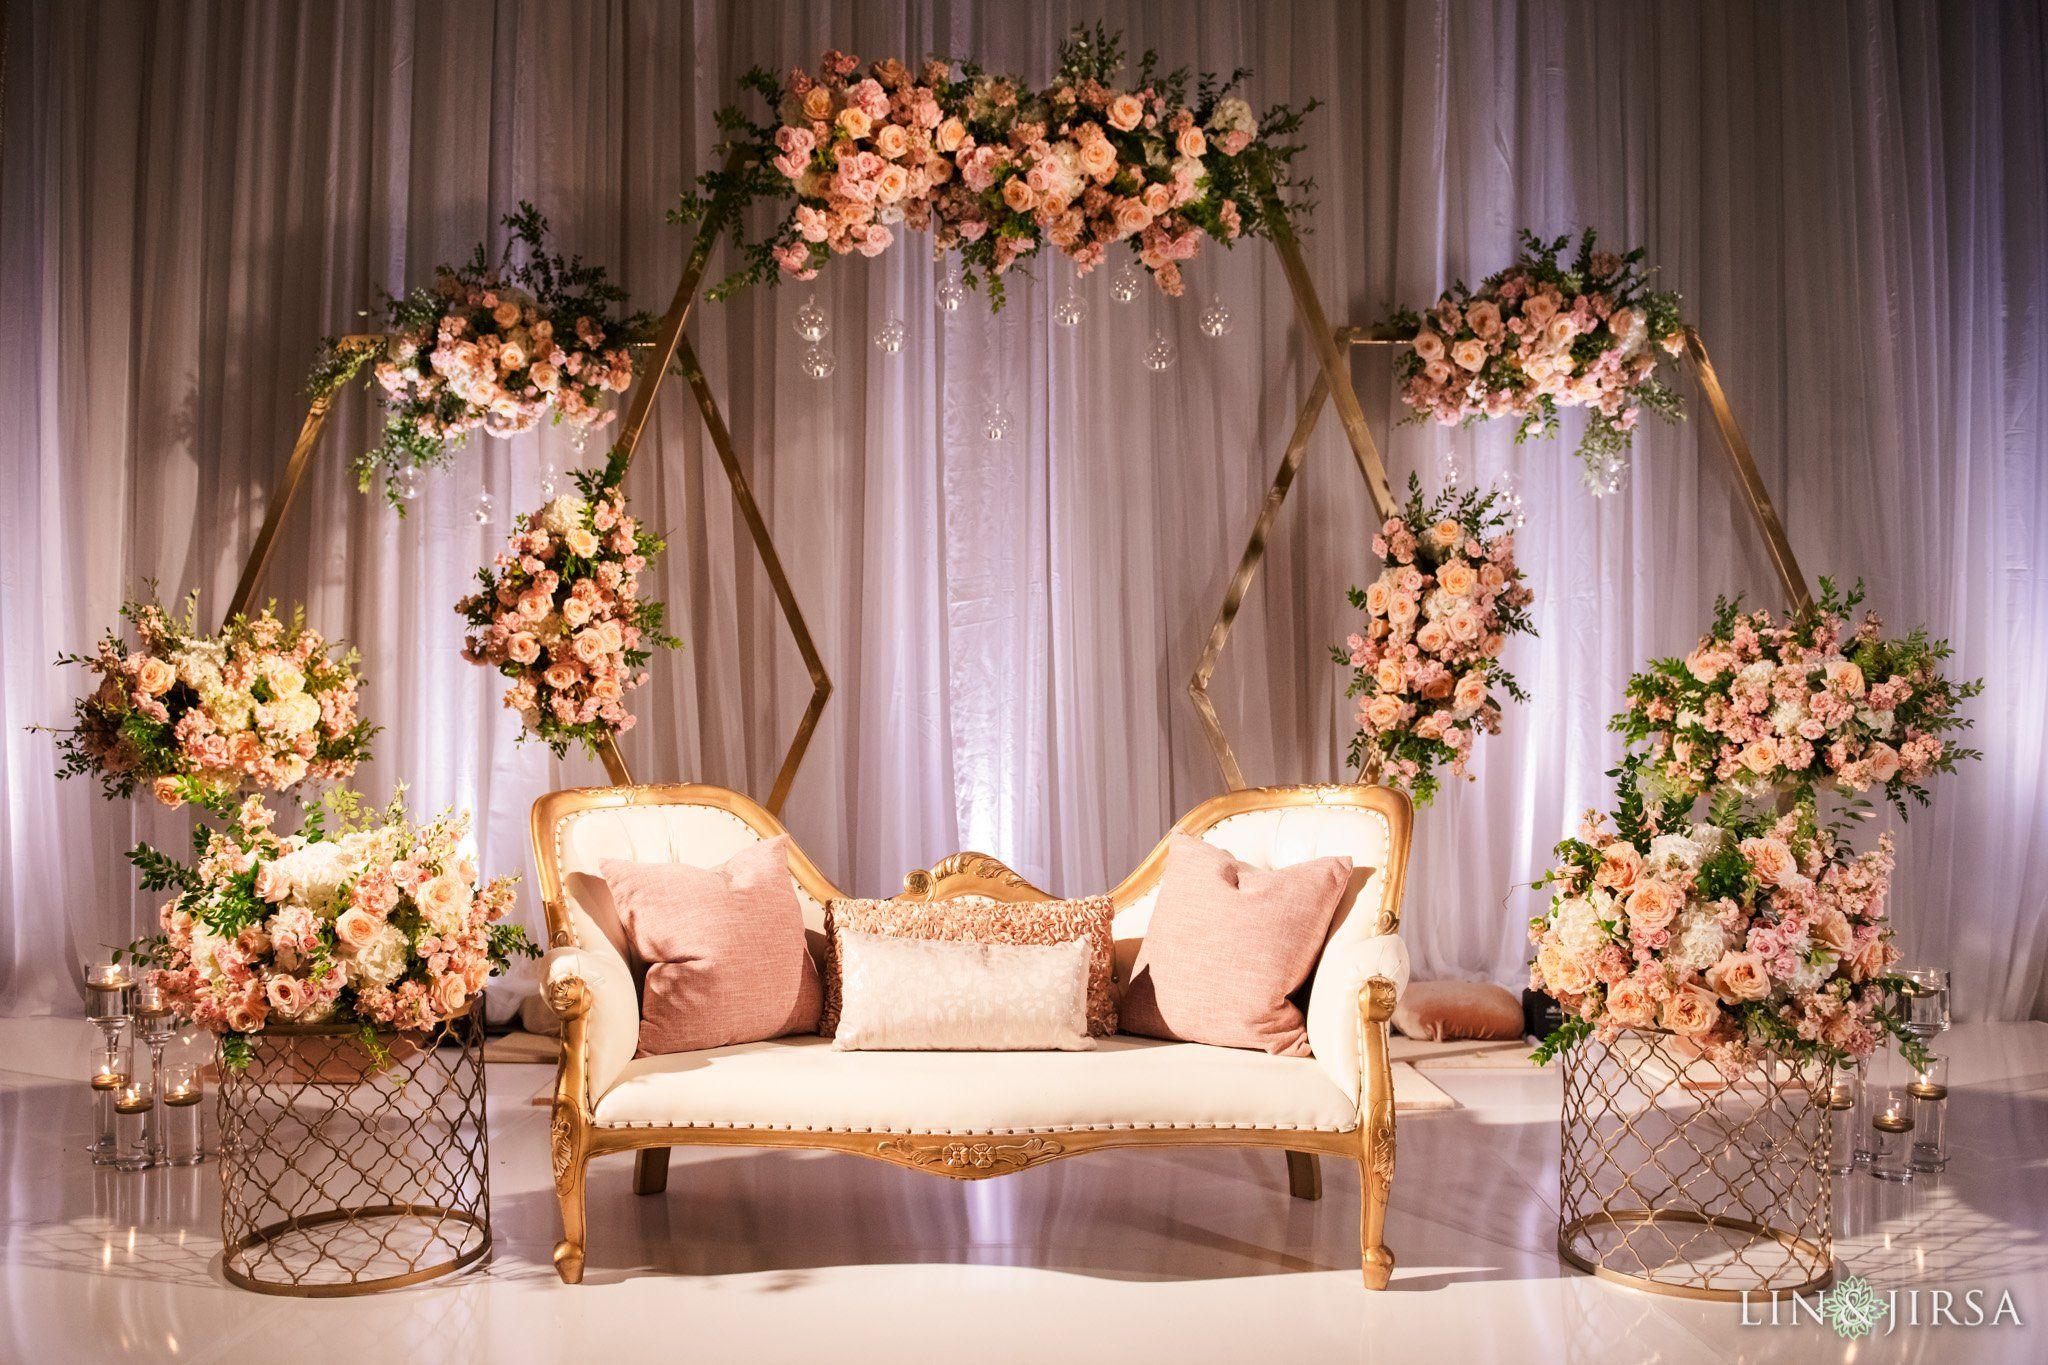 Marriott Hotel San Diego Muslim Wedding Asmaa Omar Wedding Backdrop Design Wedding Backdrop Decorations Wedding Reception Backdrop